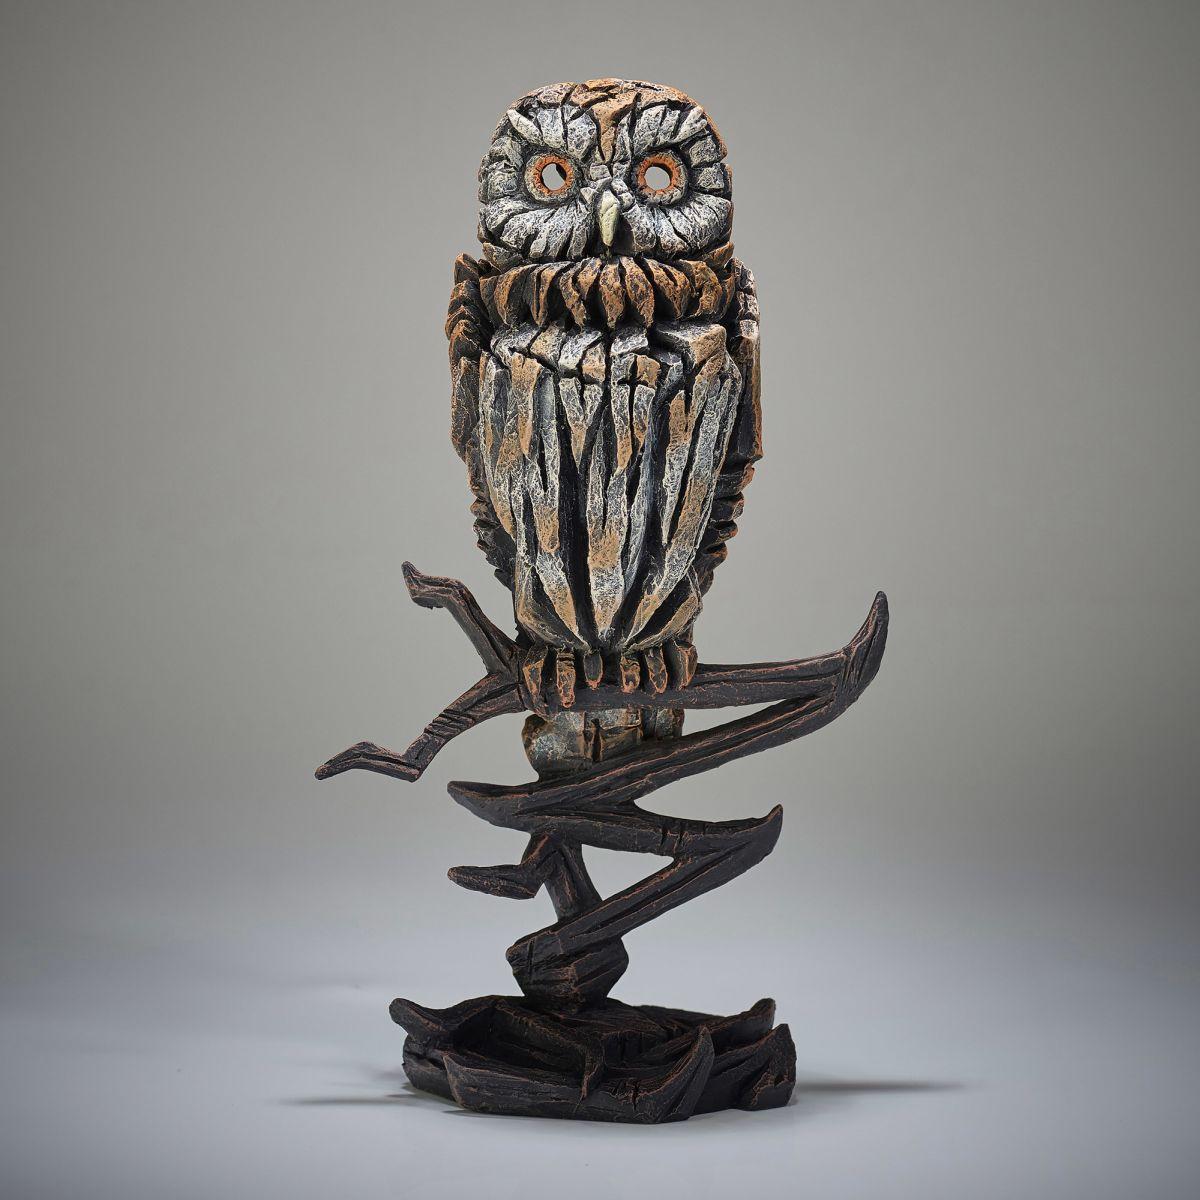 Edge Owl Small